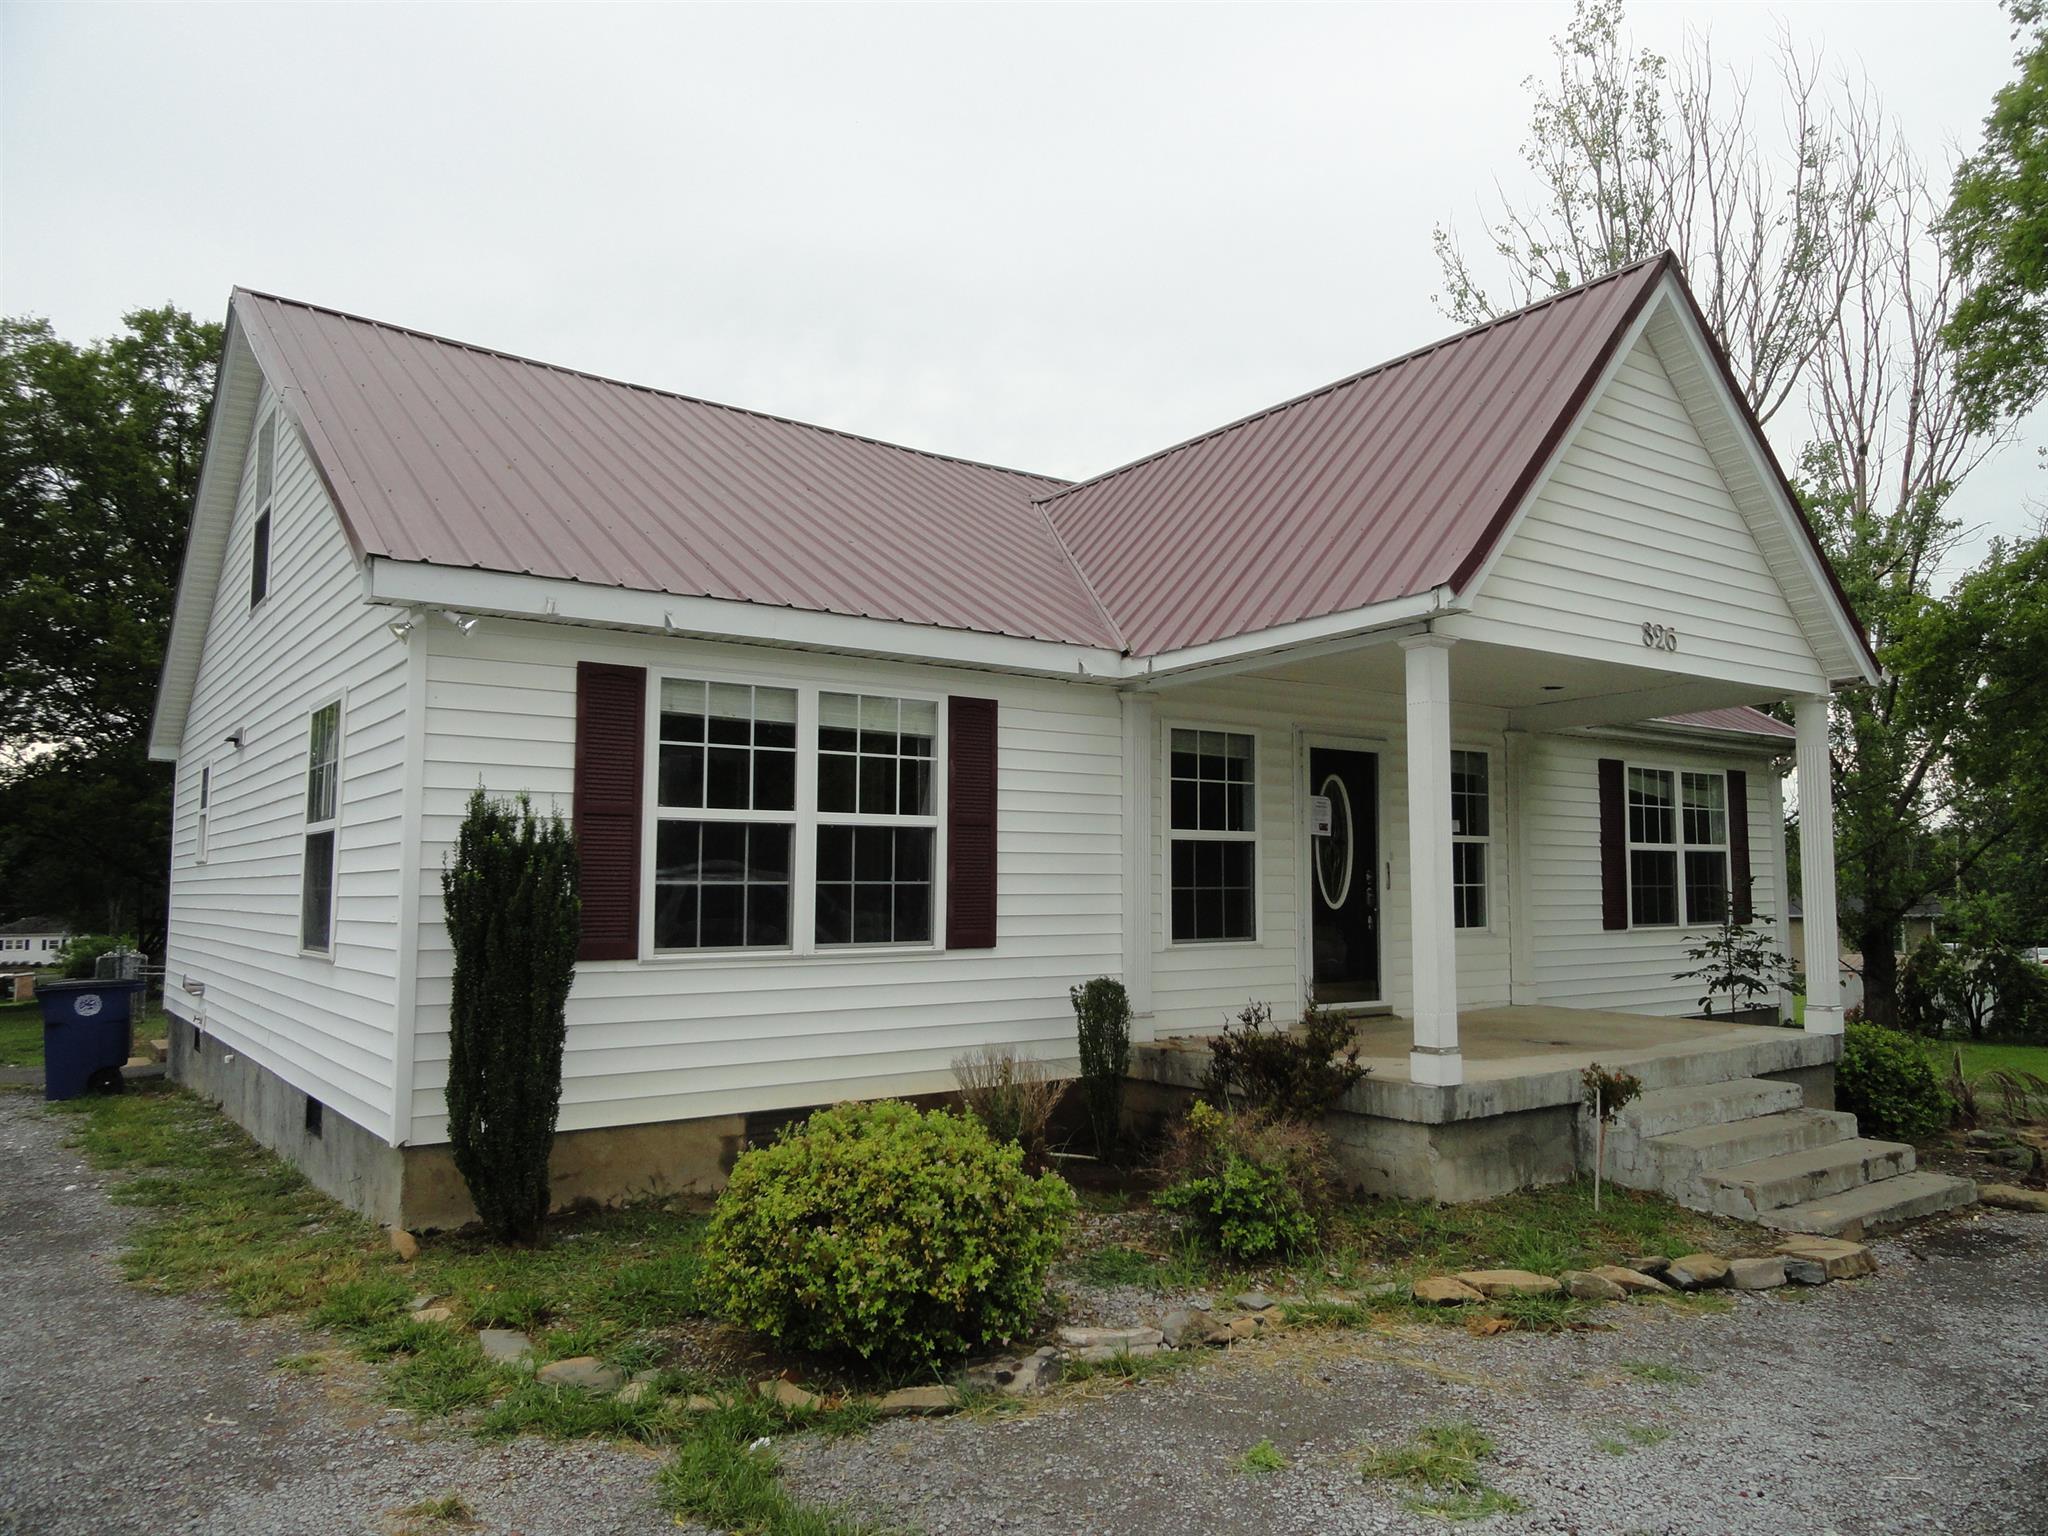 826 S Cannon Blvd, Shelbyville, TN 37160